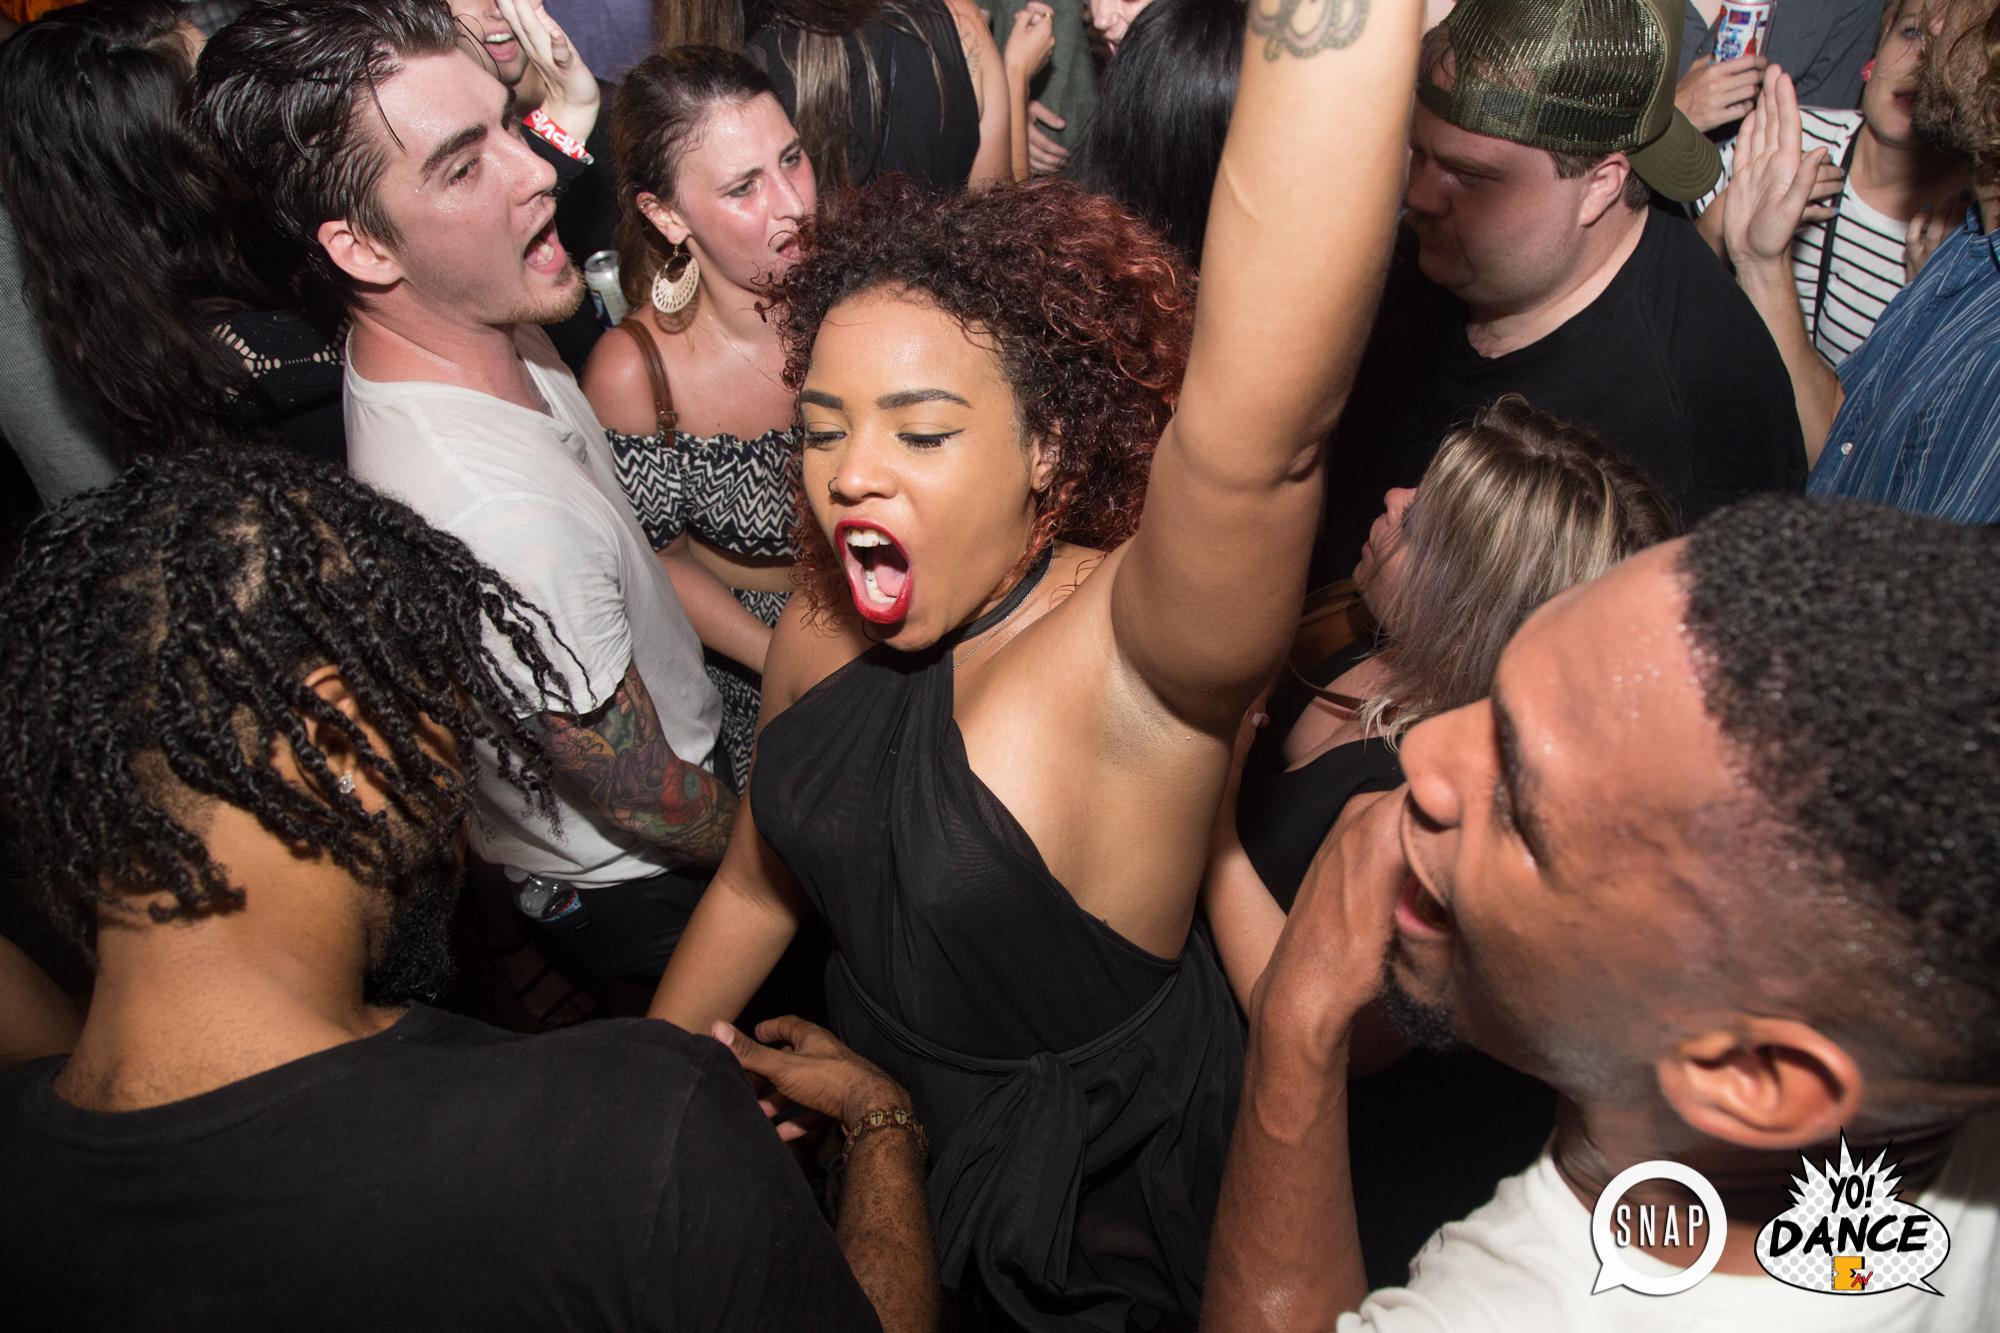 56Yo Dance Oh Snap Kid Atlanta.jpg